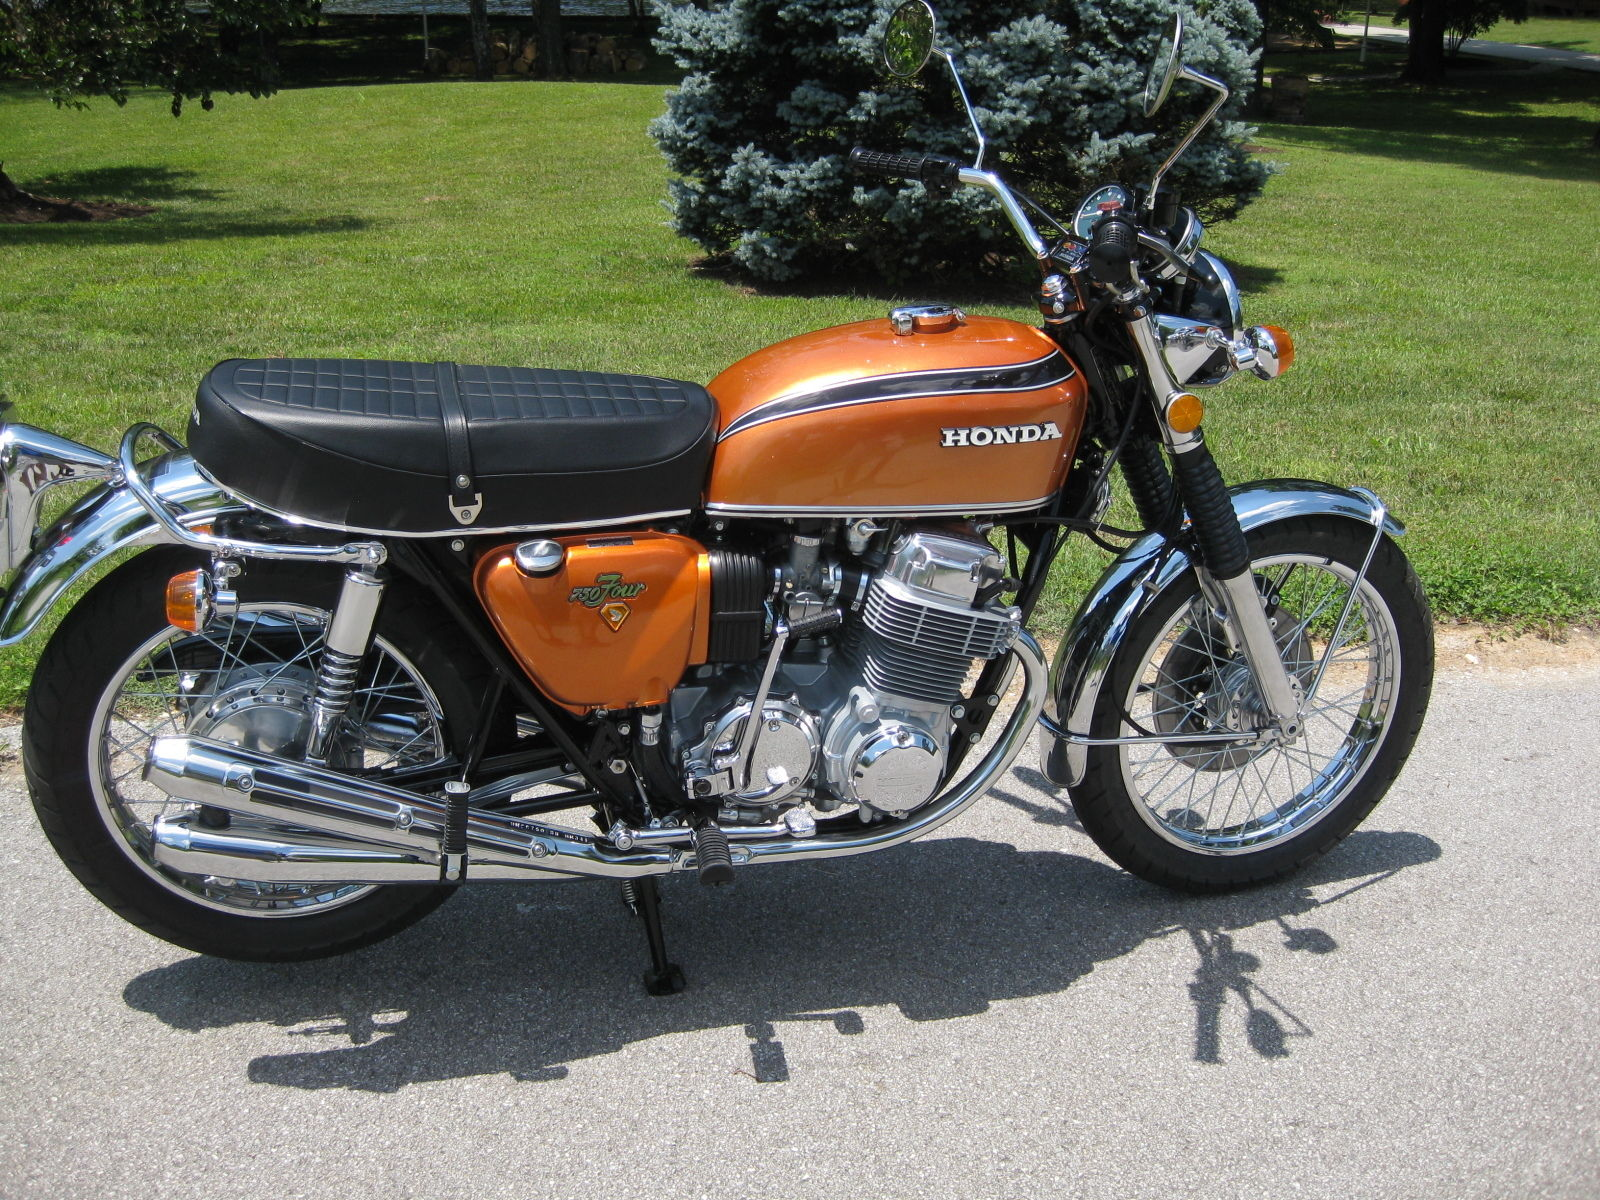 Restored honda cb750 1972 photographs at classic bikes restored honda cb750 1972 publicscrutiny Choice Image